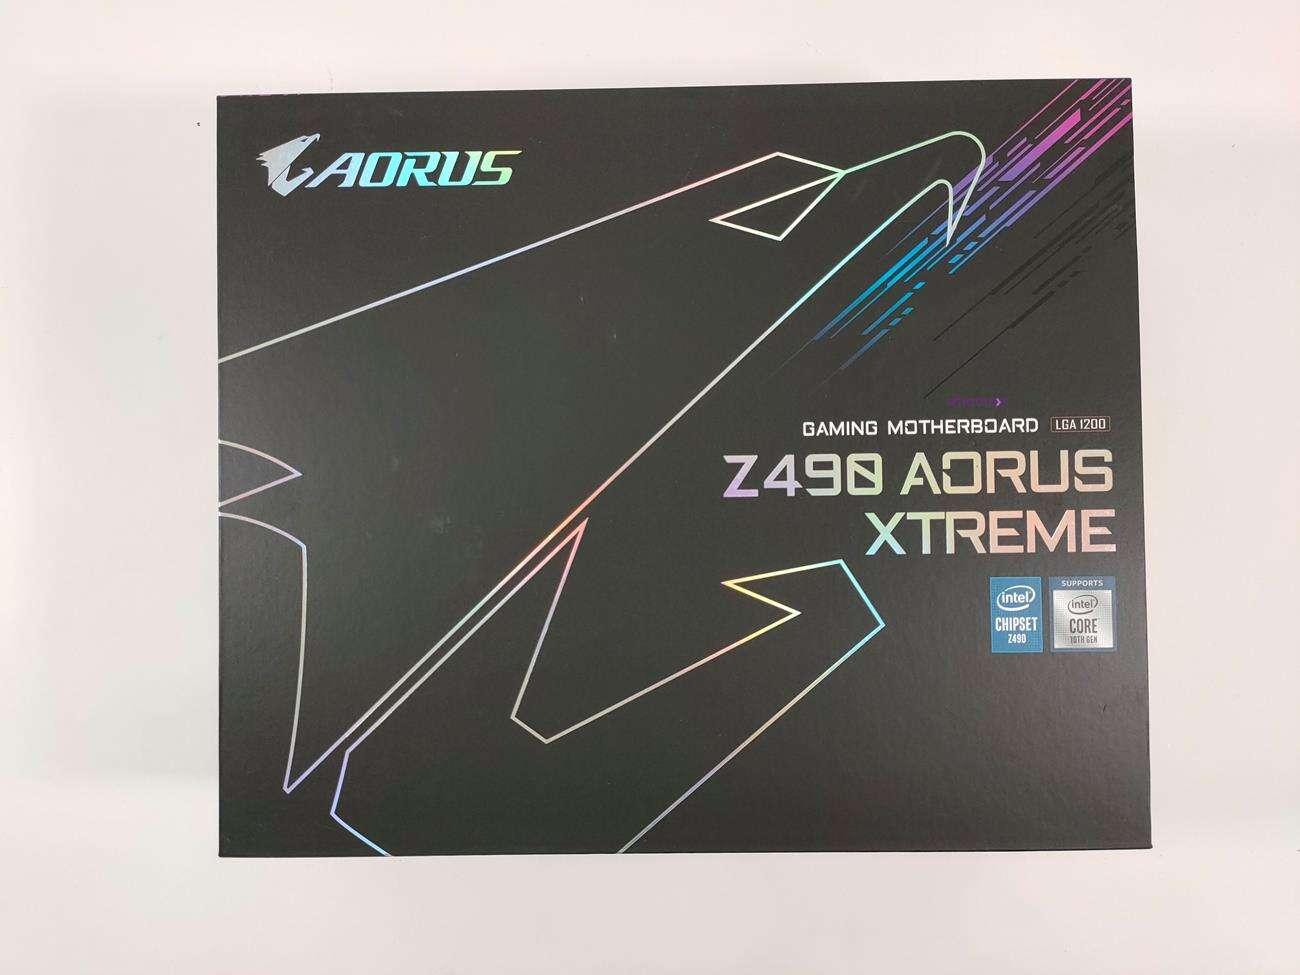 test Z490 Aorus Xtreme, recenzja Z490 Aorus Xtreme, review Z490 Aorus Xtreme, opinia Z490 Aorus Xtreme